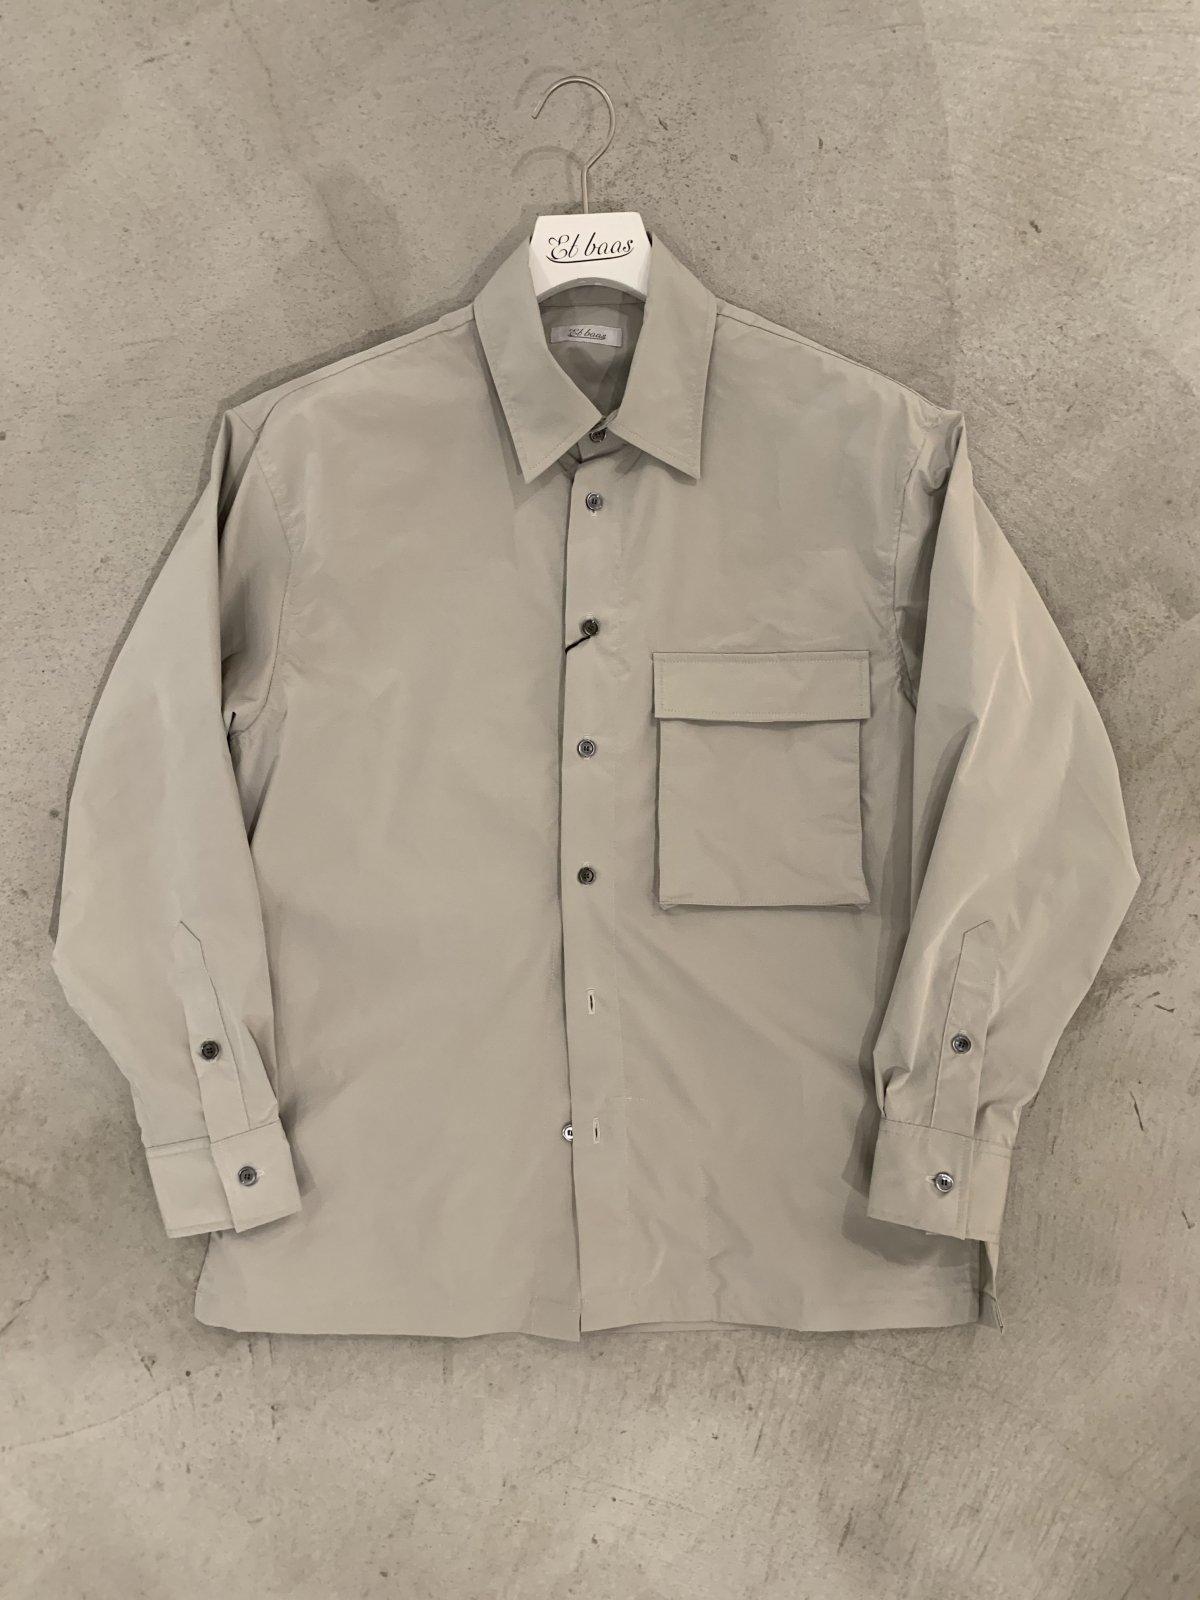 Et baas CAPABLE Shirts 詳細画像12